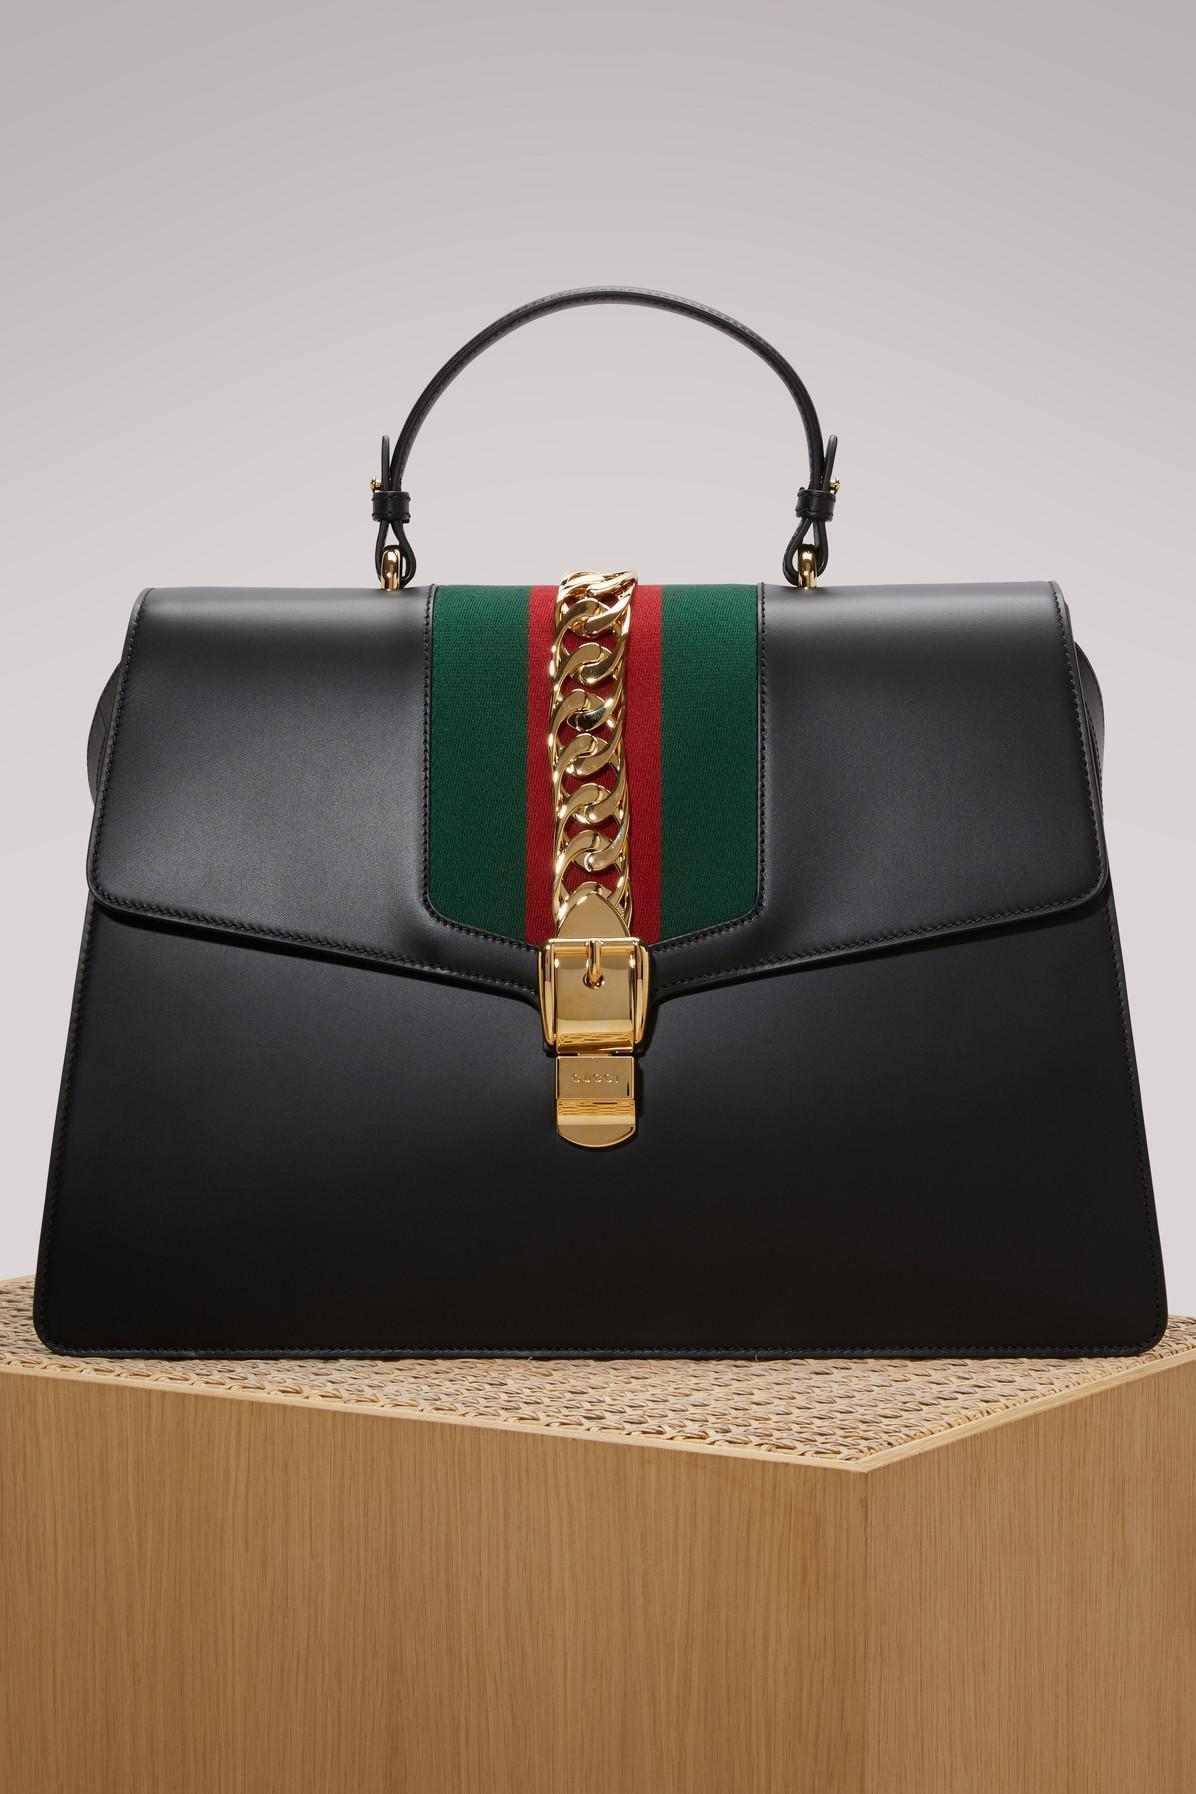 Gucci MAXI DOME LEATHER TOP HANDLE BAG GDKts